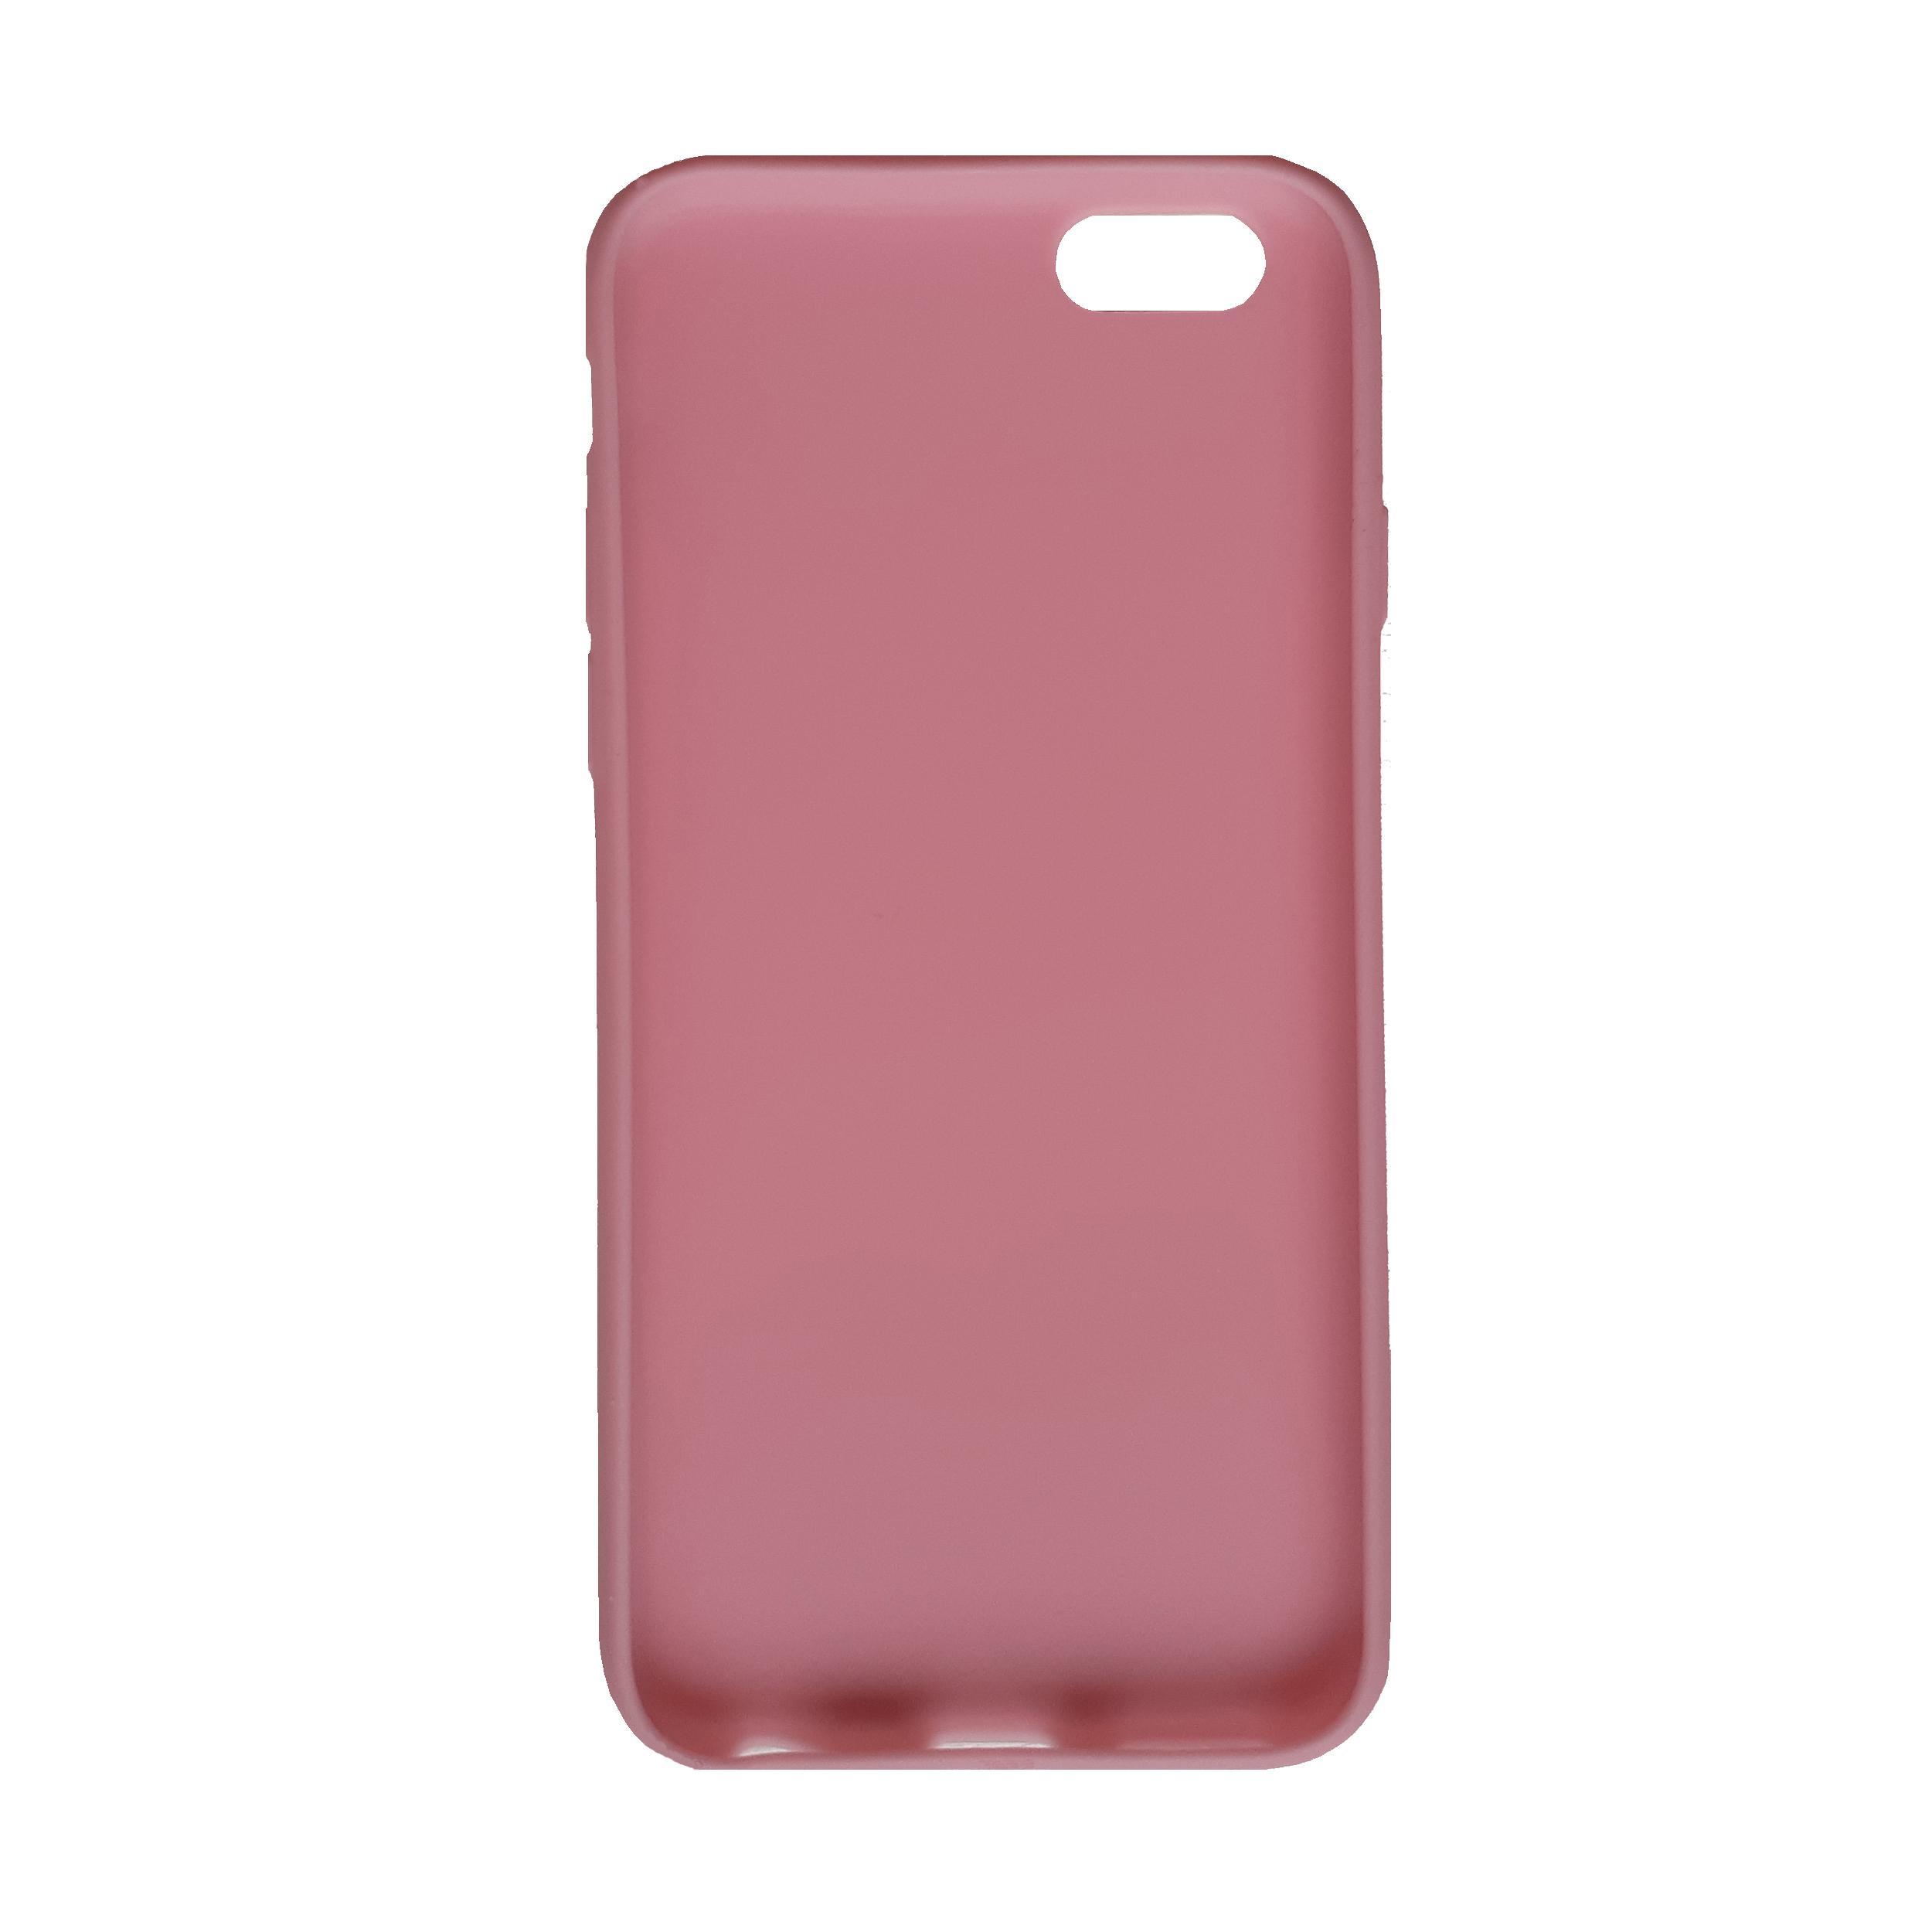 کاور مدل M-6G مناسب برای گوشی موبایل اپل iphone 6/6S main 1 2